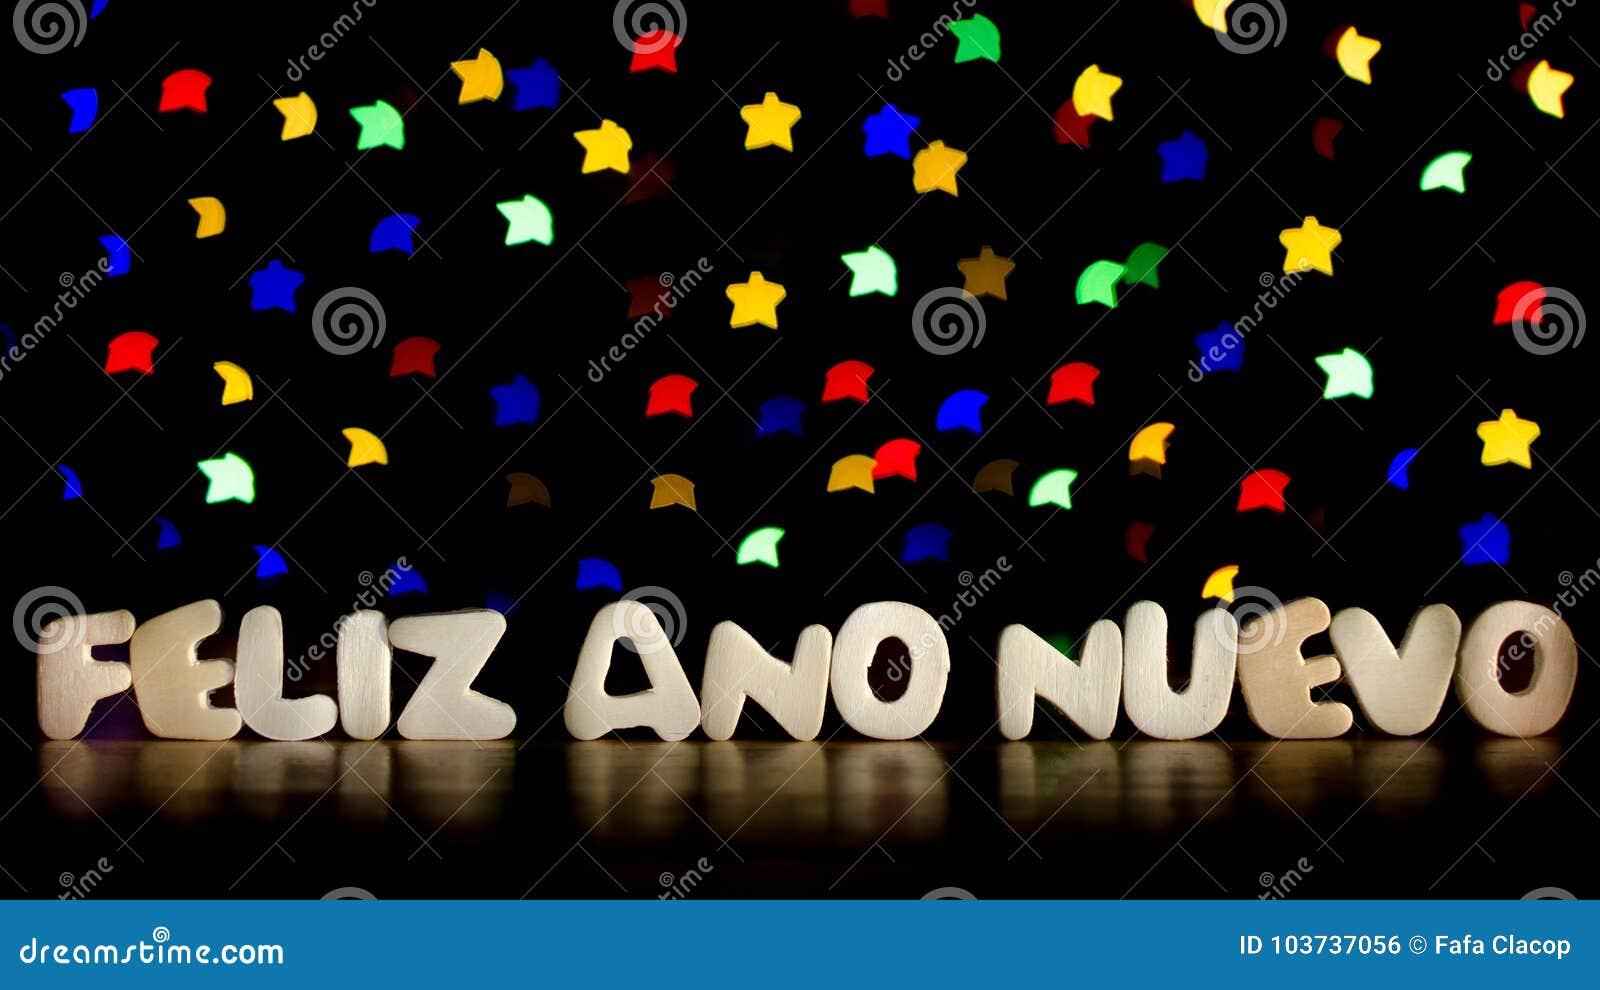 Feliz Ano Nuevo, Happy New Year In Spanish Language Stock ...